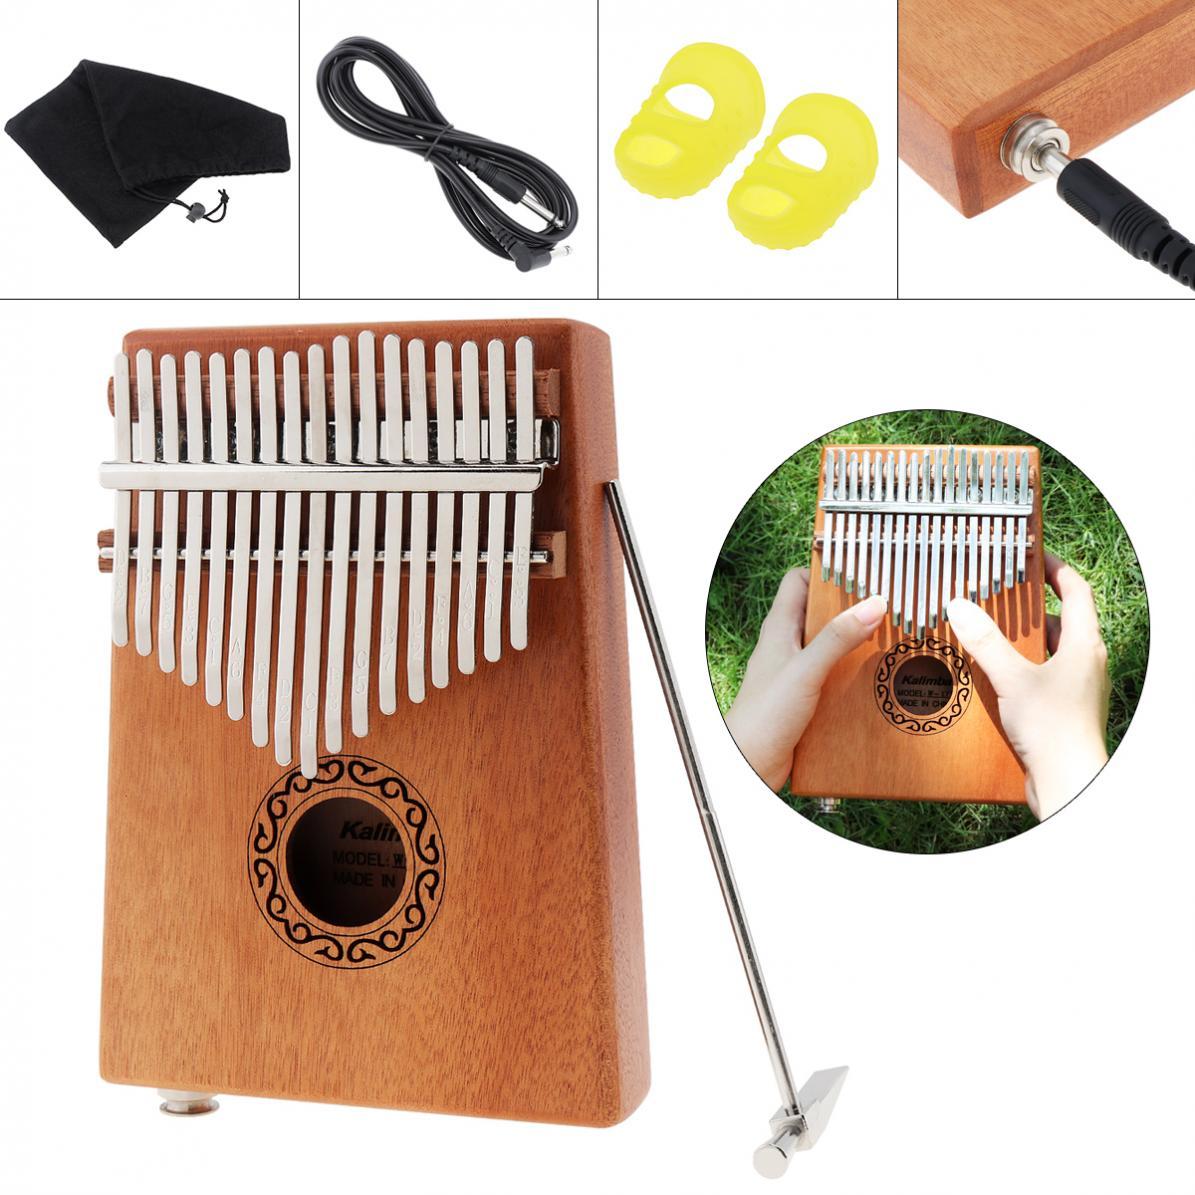 Kalimba com Acessórios Chave Eletroacústica Kalimba Placa Única Mogno Polegar Piano Mbira Mini Teclado Instrumento 17